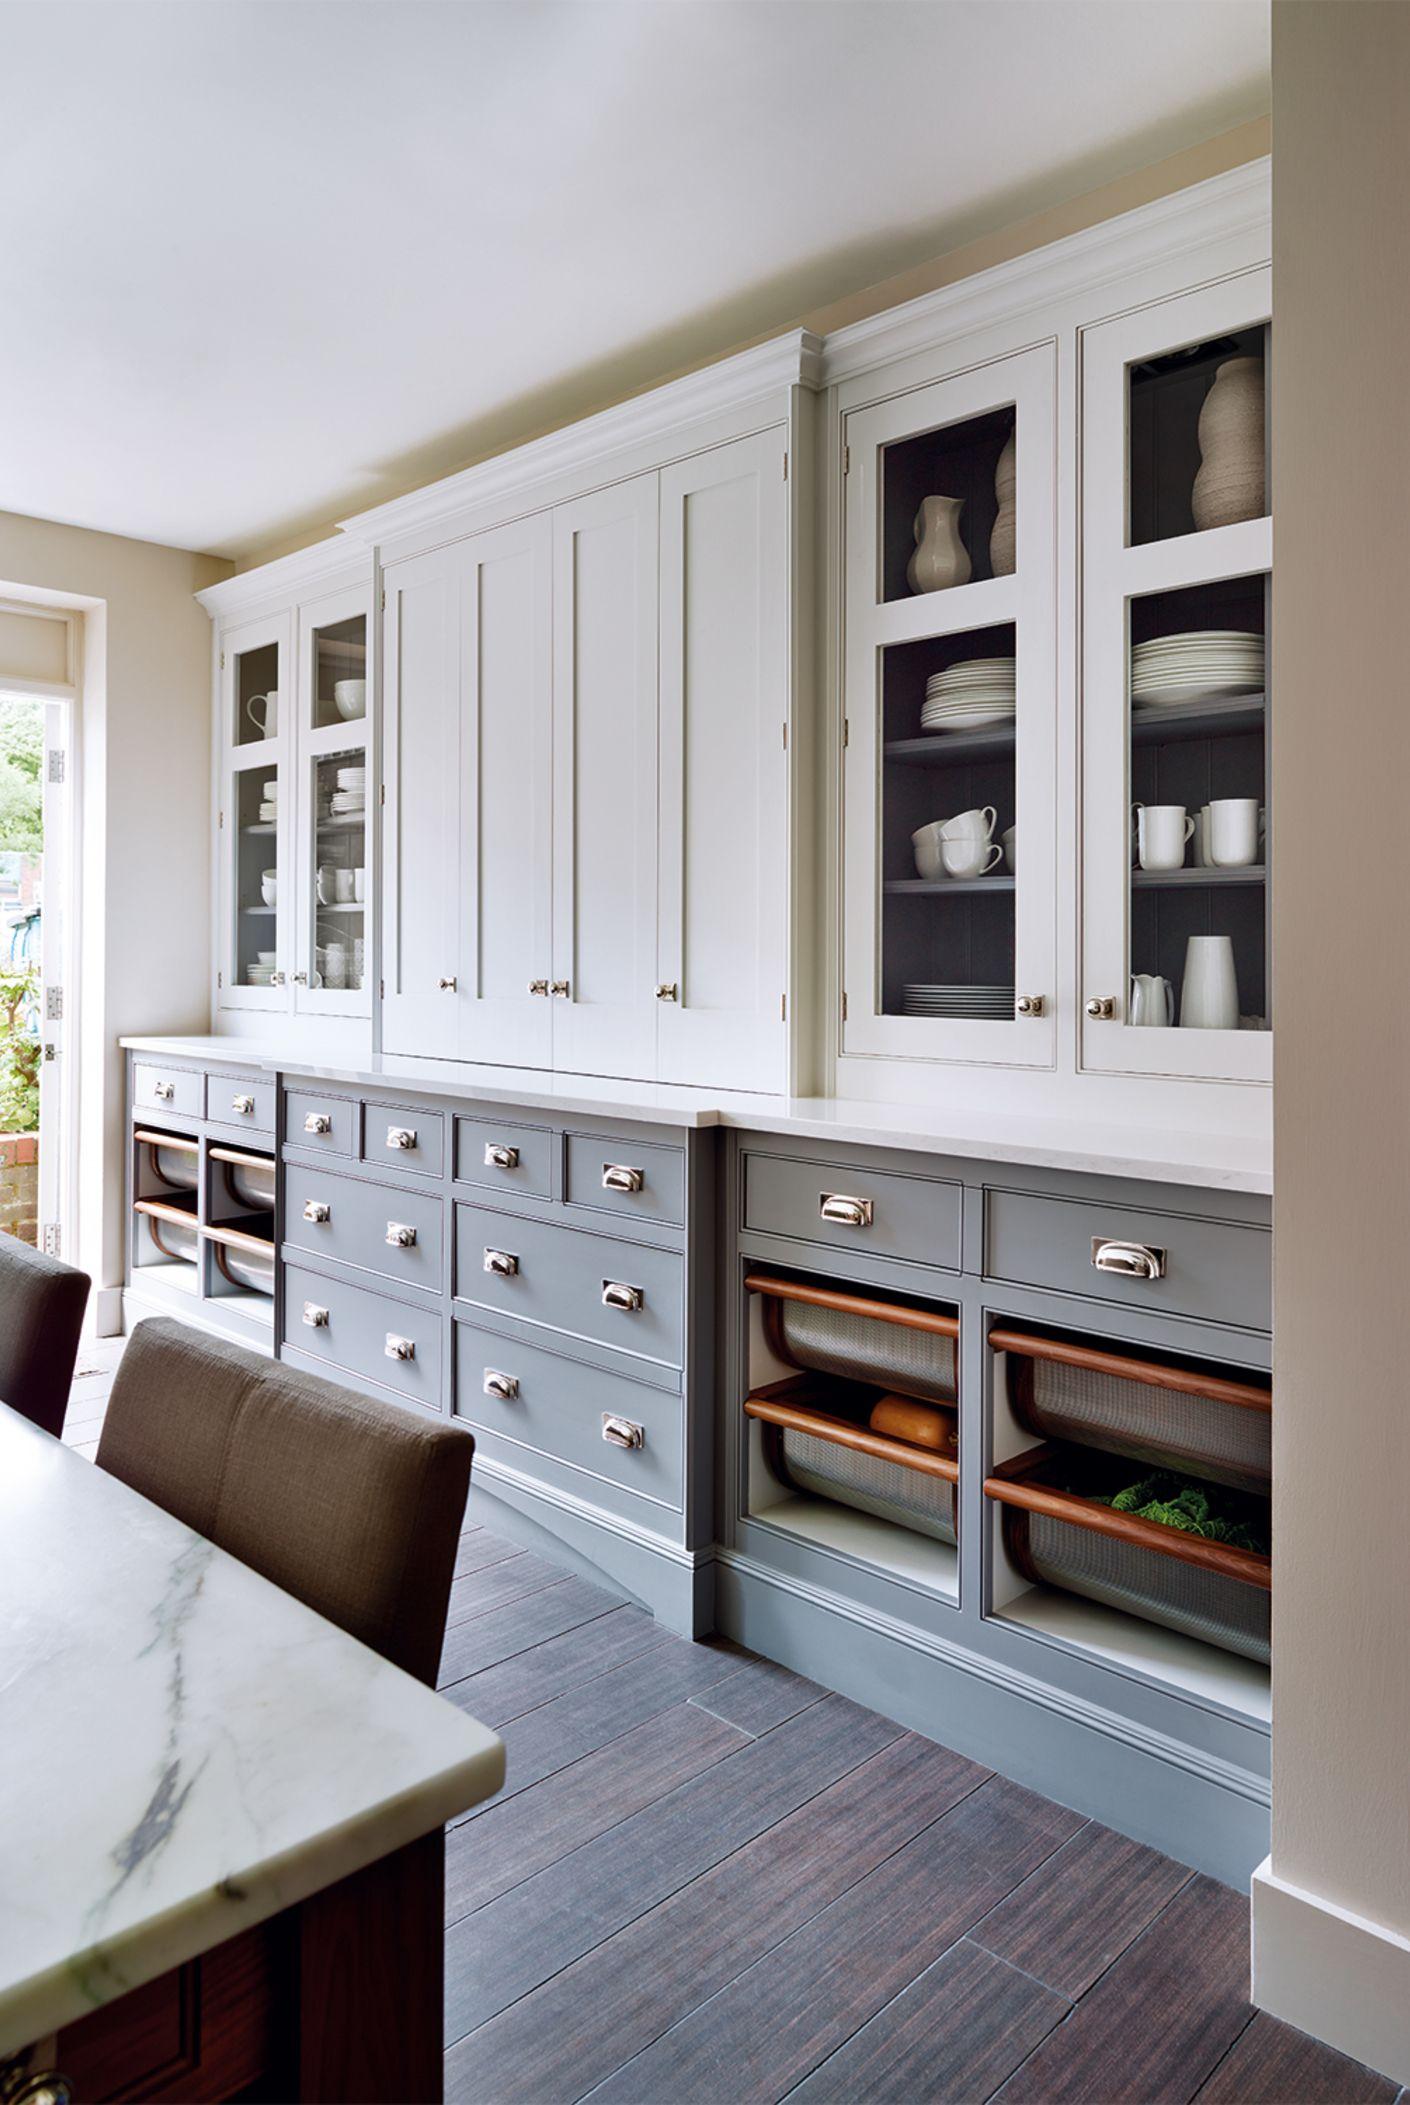 Kitchen Bathroom Bedroom Design Inspiration Smallbone Kitchens Two Tone Kitchen Cabinets Best Kitchen Cabinets